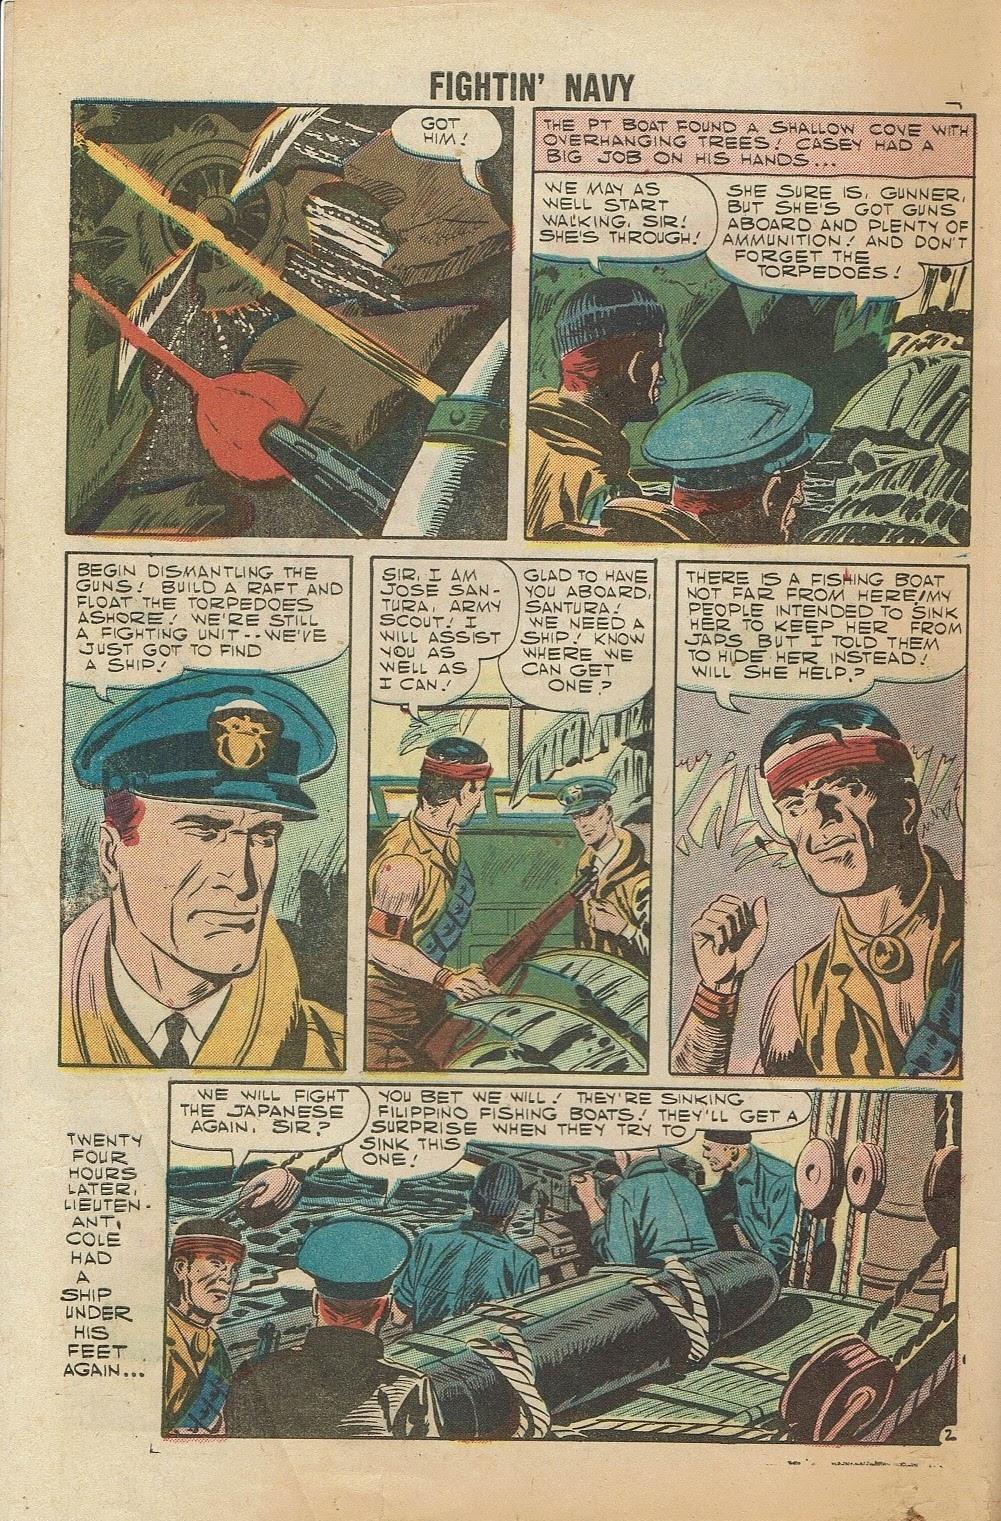 Read online Fightin' Navy comic -  Issue #81 - 4